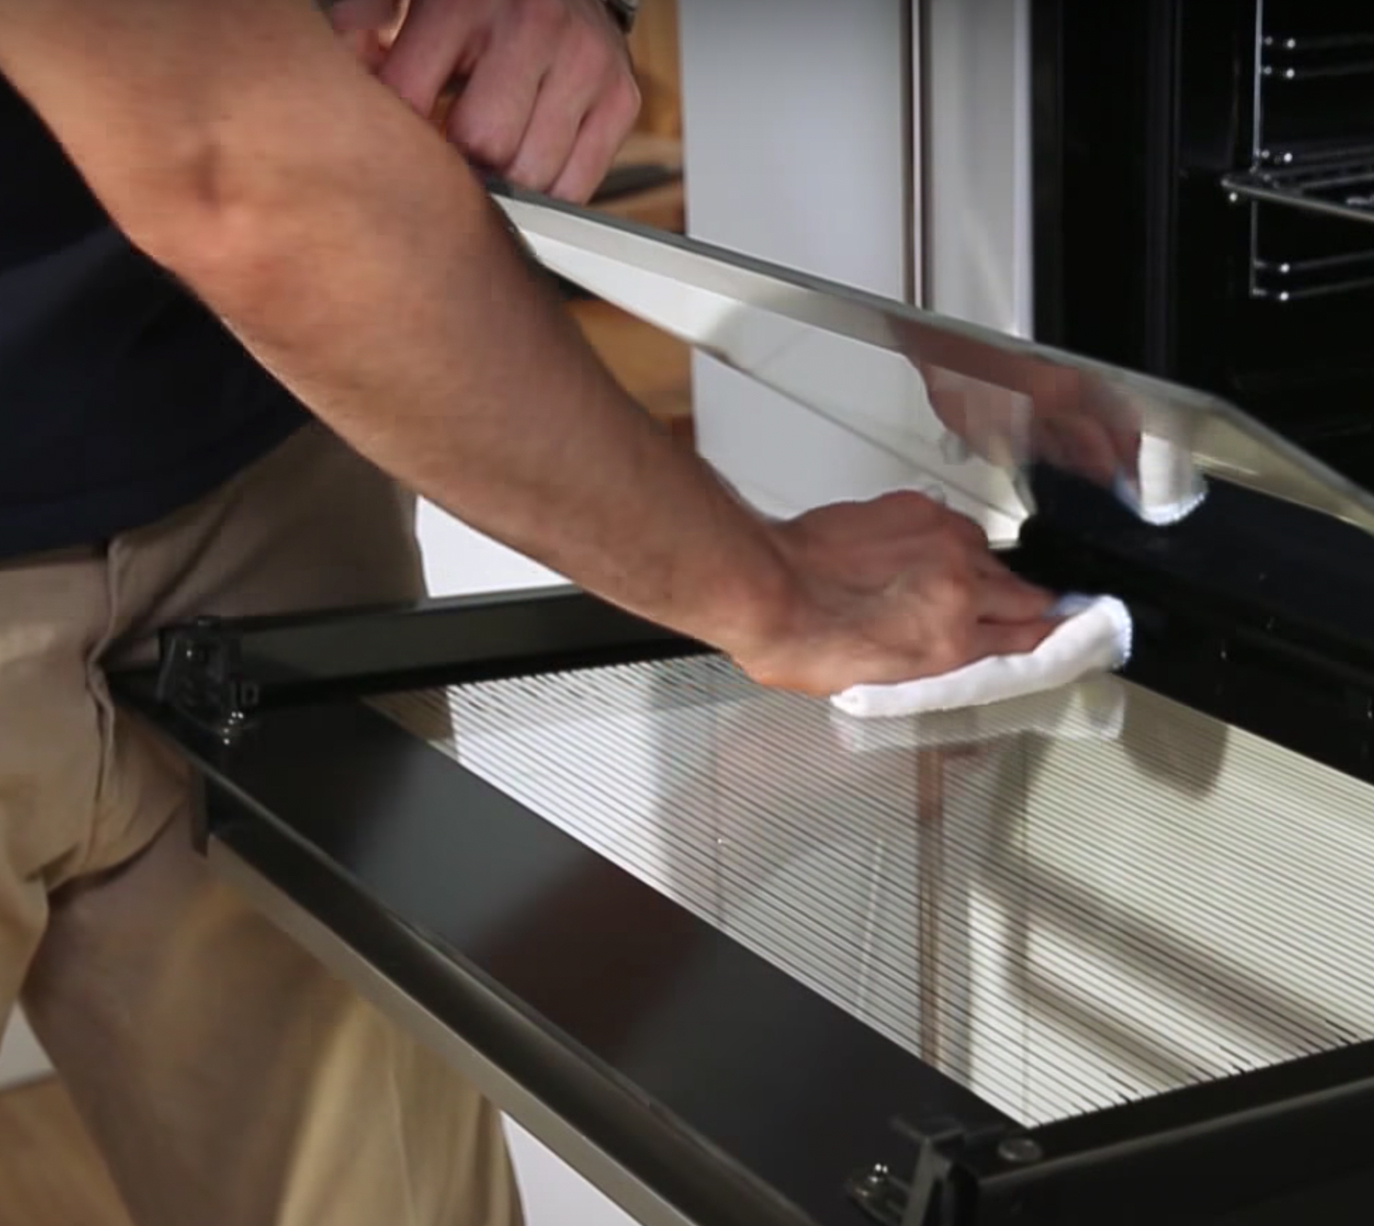 Removable Oven Door Glass